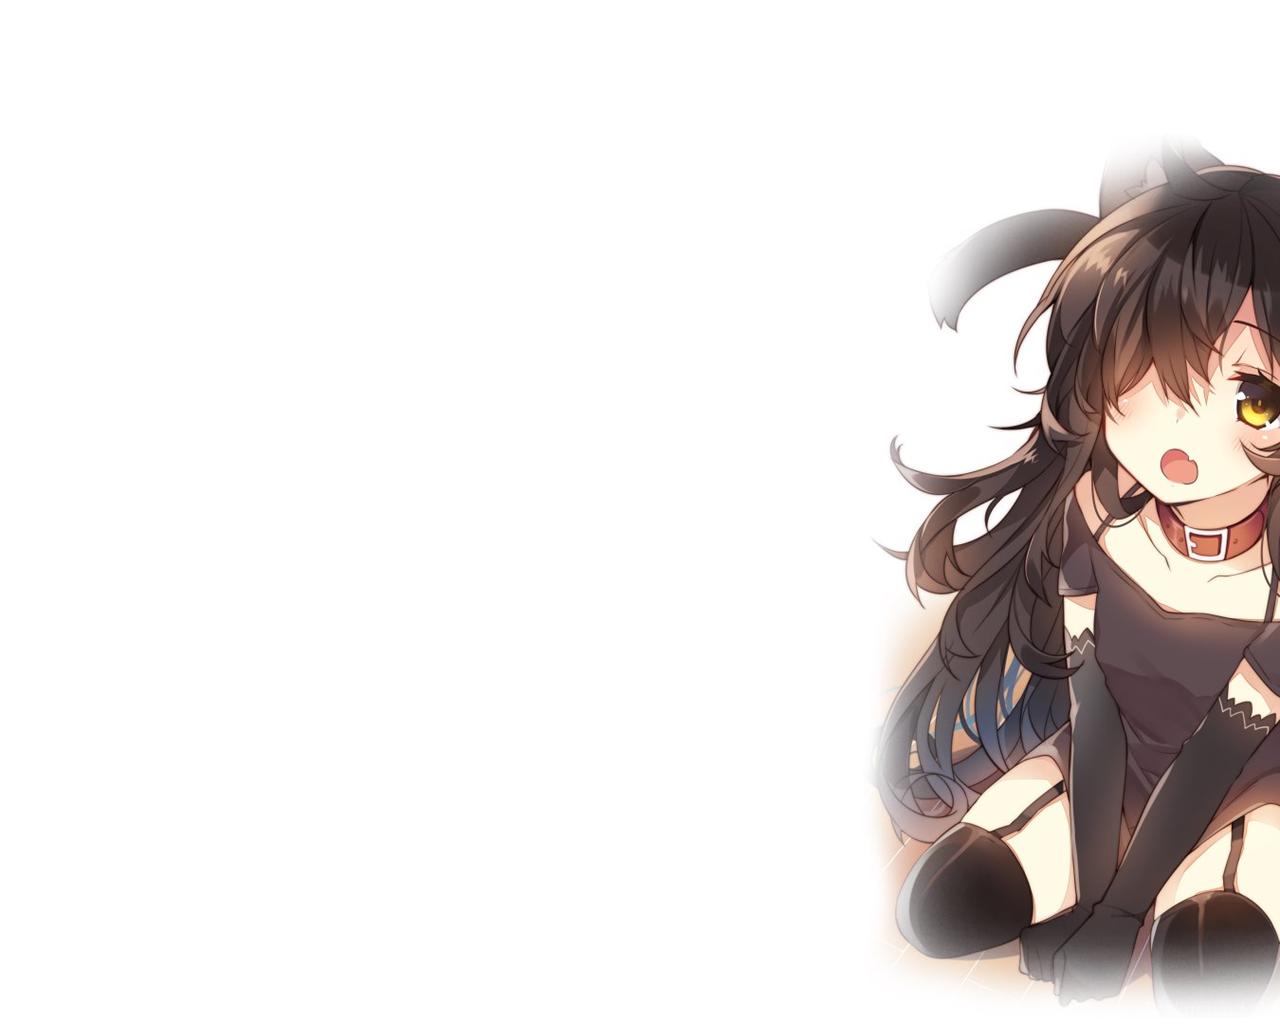 Kawaii Cat Girl Wallpapers Imgur Desktop Background